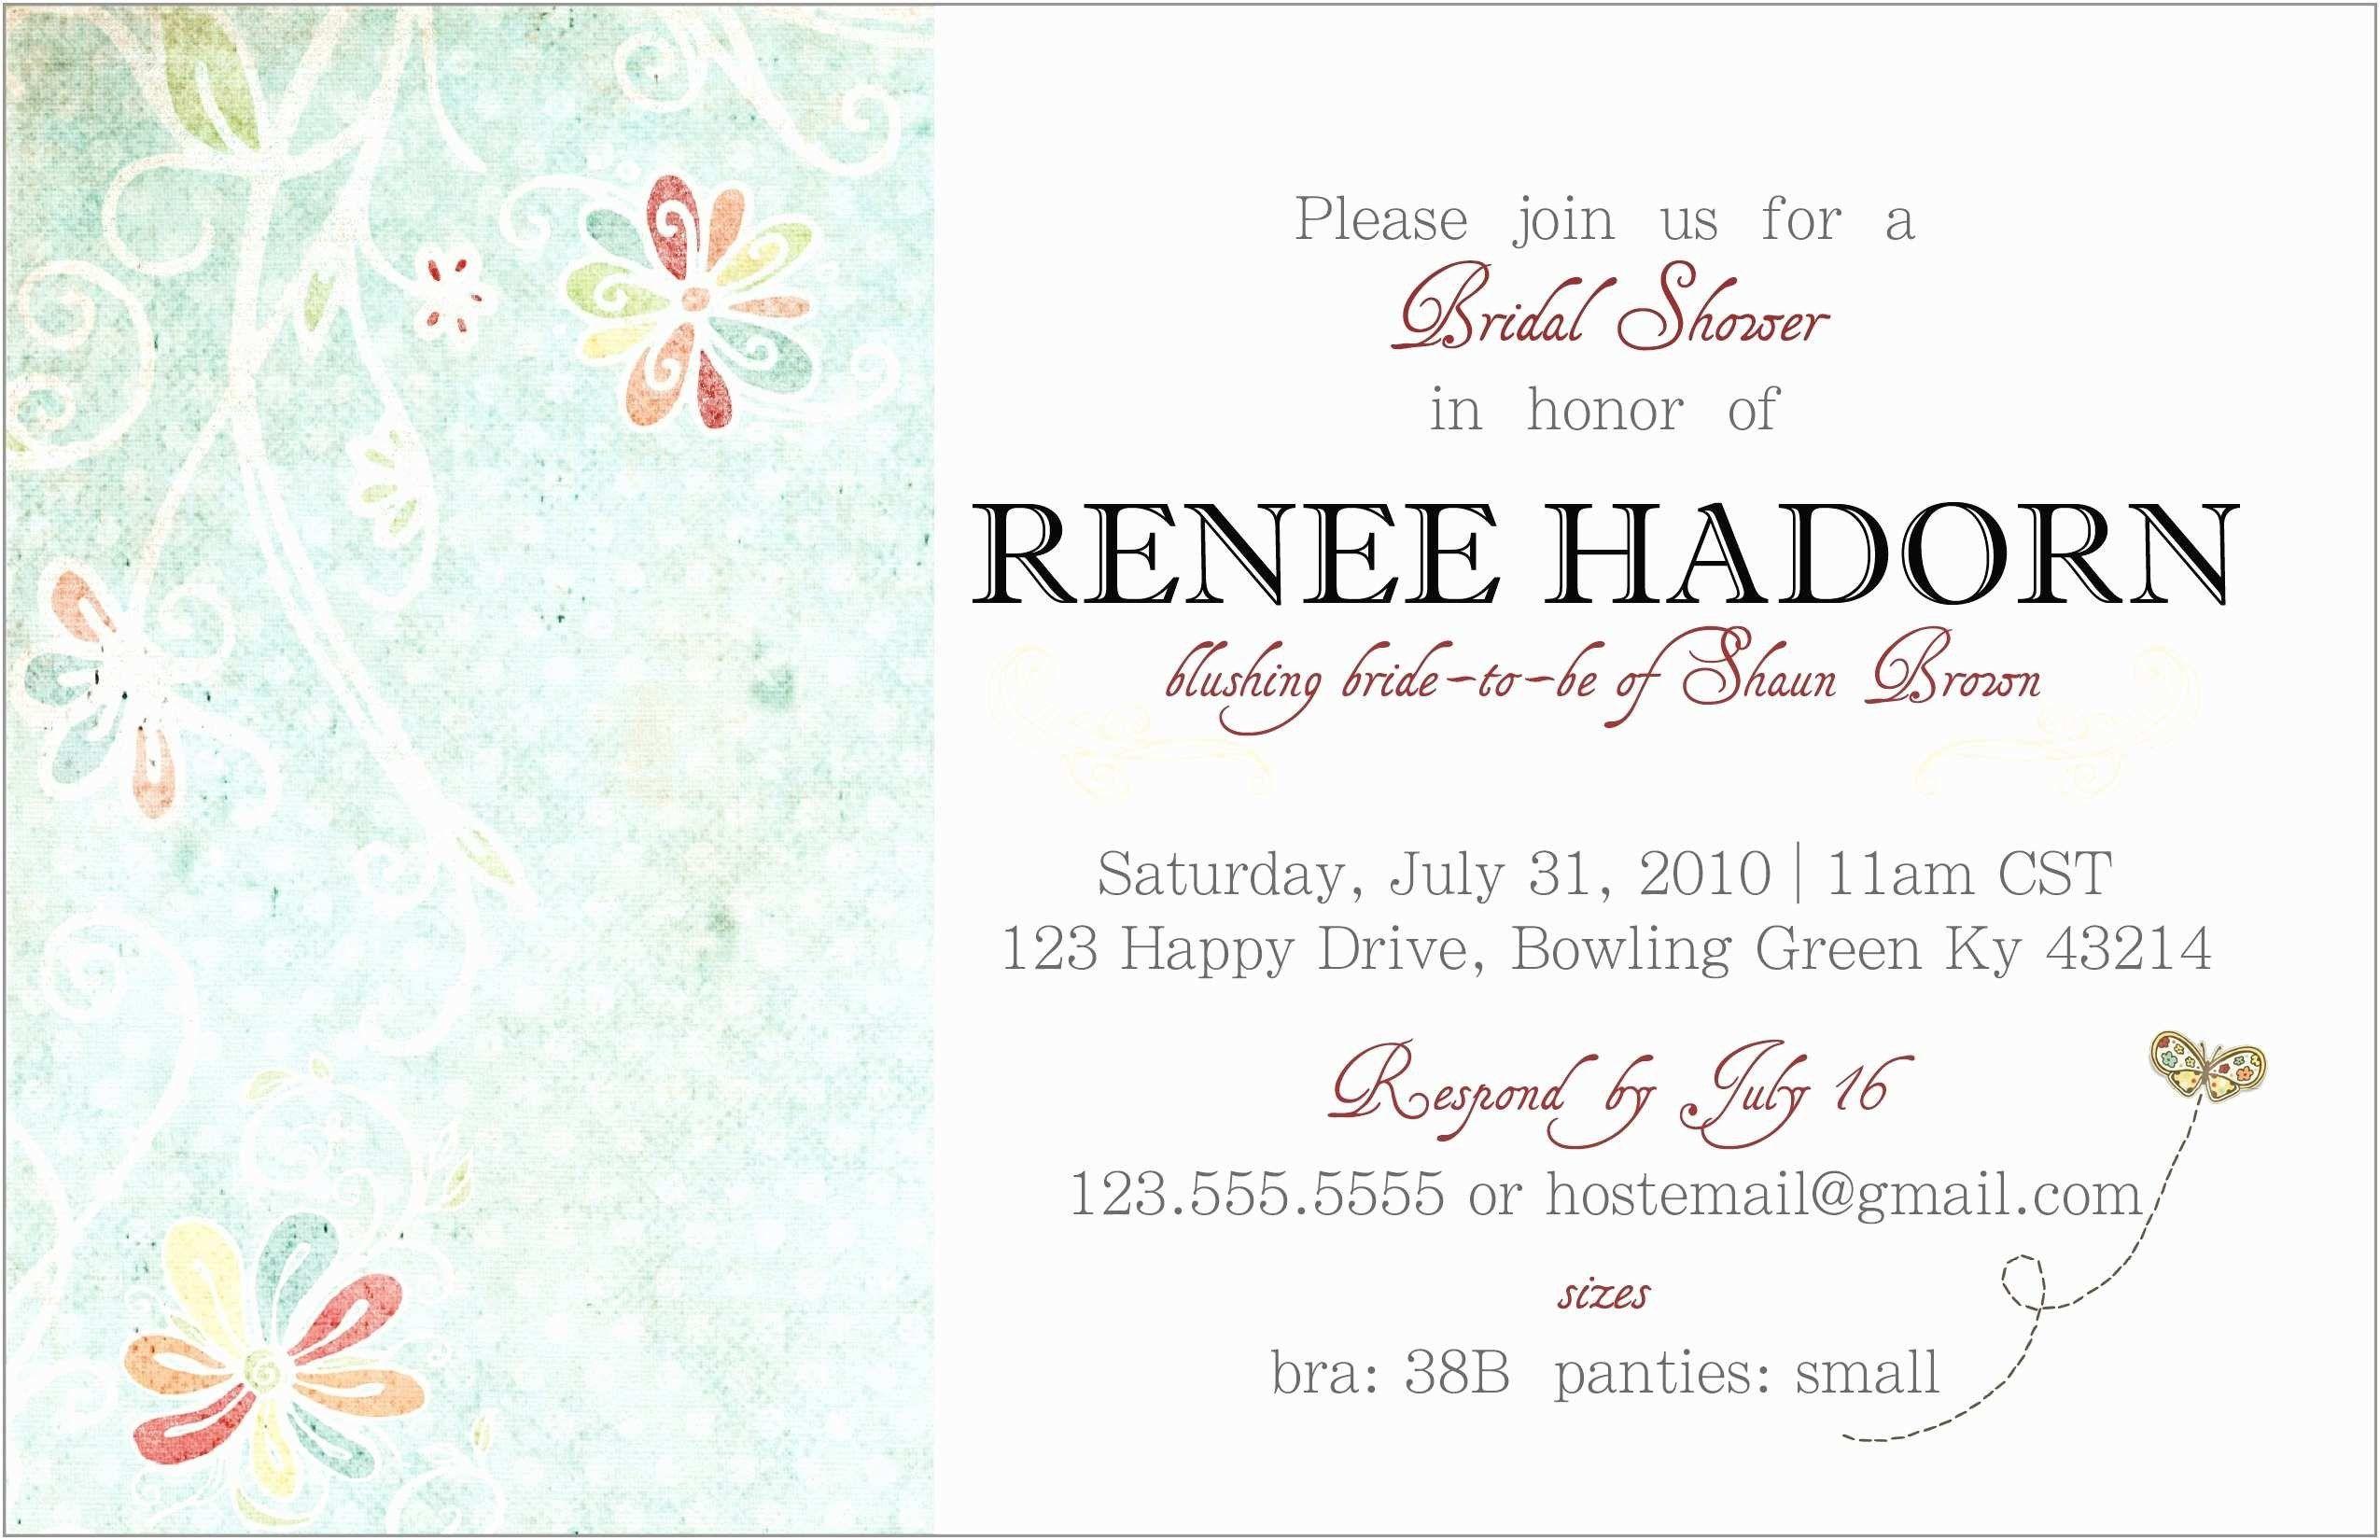 Target Bridal Shower Invitations Elegant Tar Wedding Invitations Tar Wedding Registry Invit Wedding Registry Invitation Shower Invitations Bridal Shower Photos